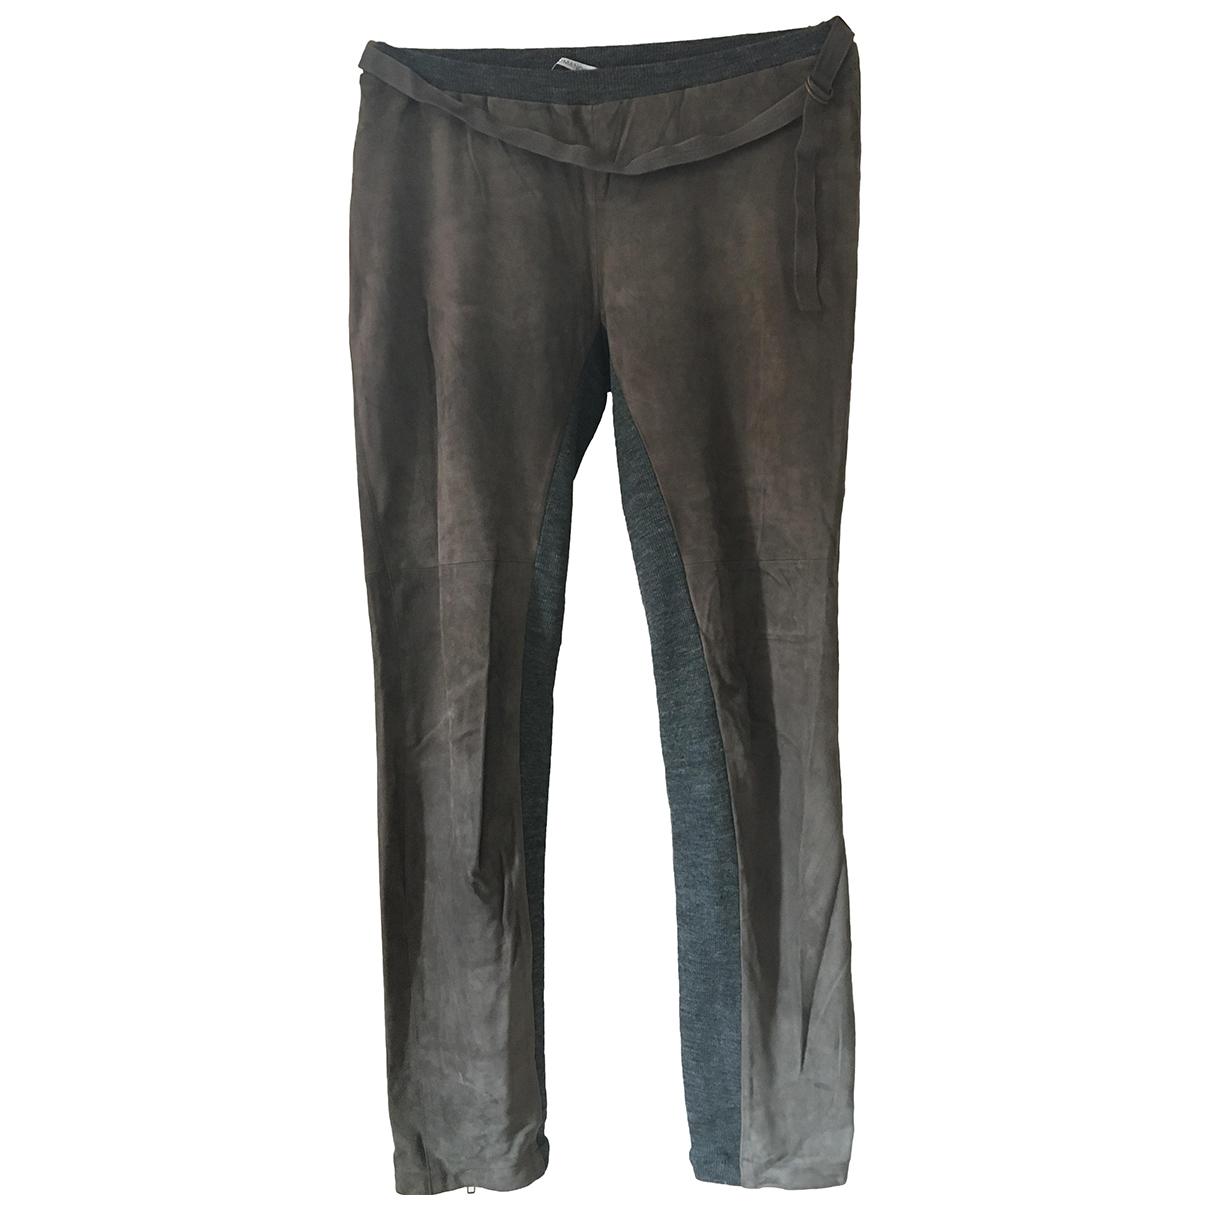 Pantalon zanahoria de Cuero Humanoid